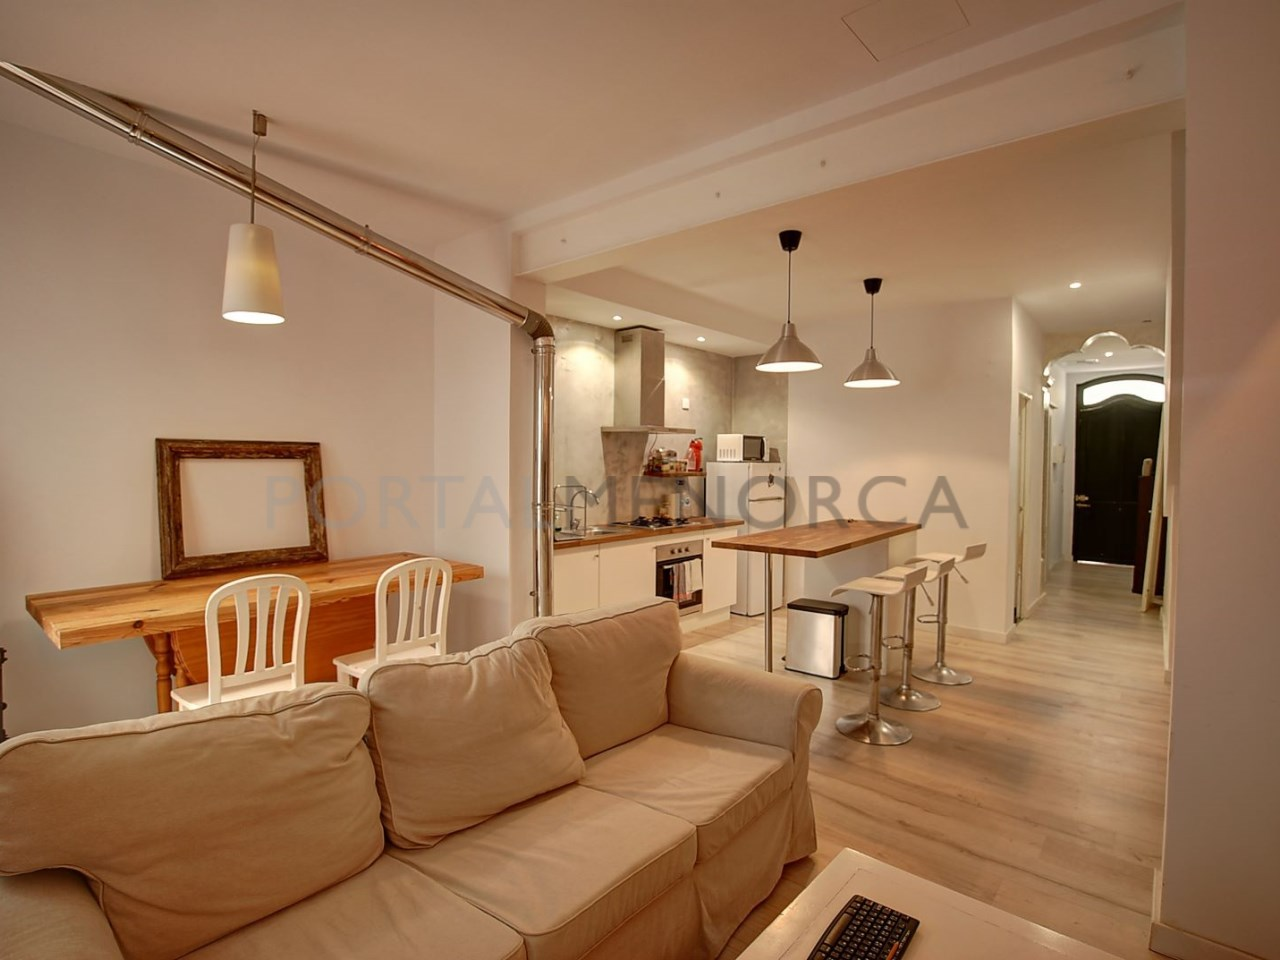 salon_casa_Reformada_centro_mahon_menorca--H2512